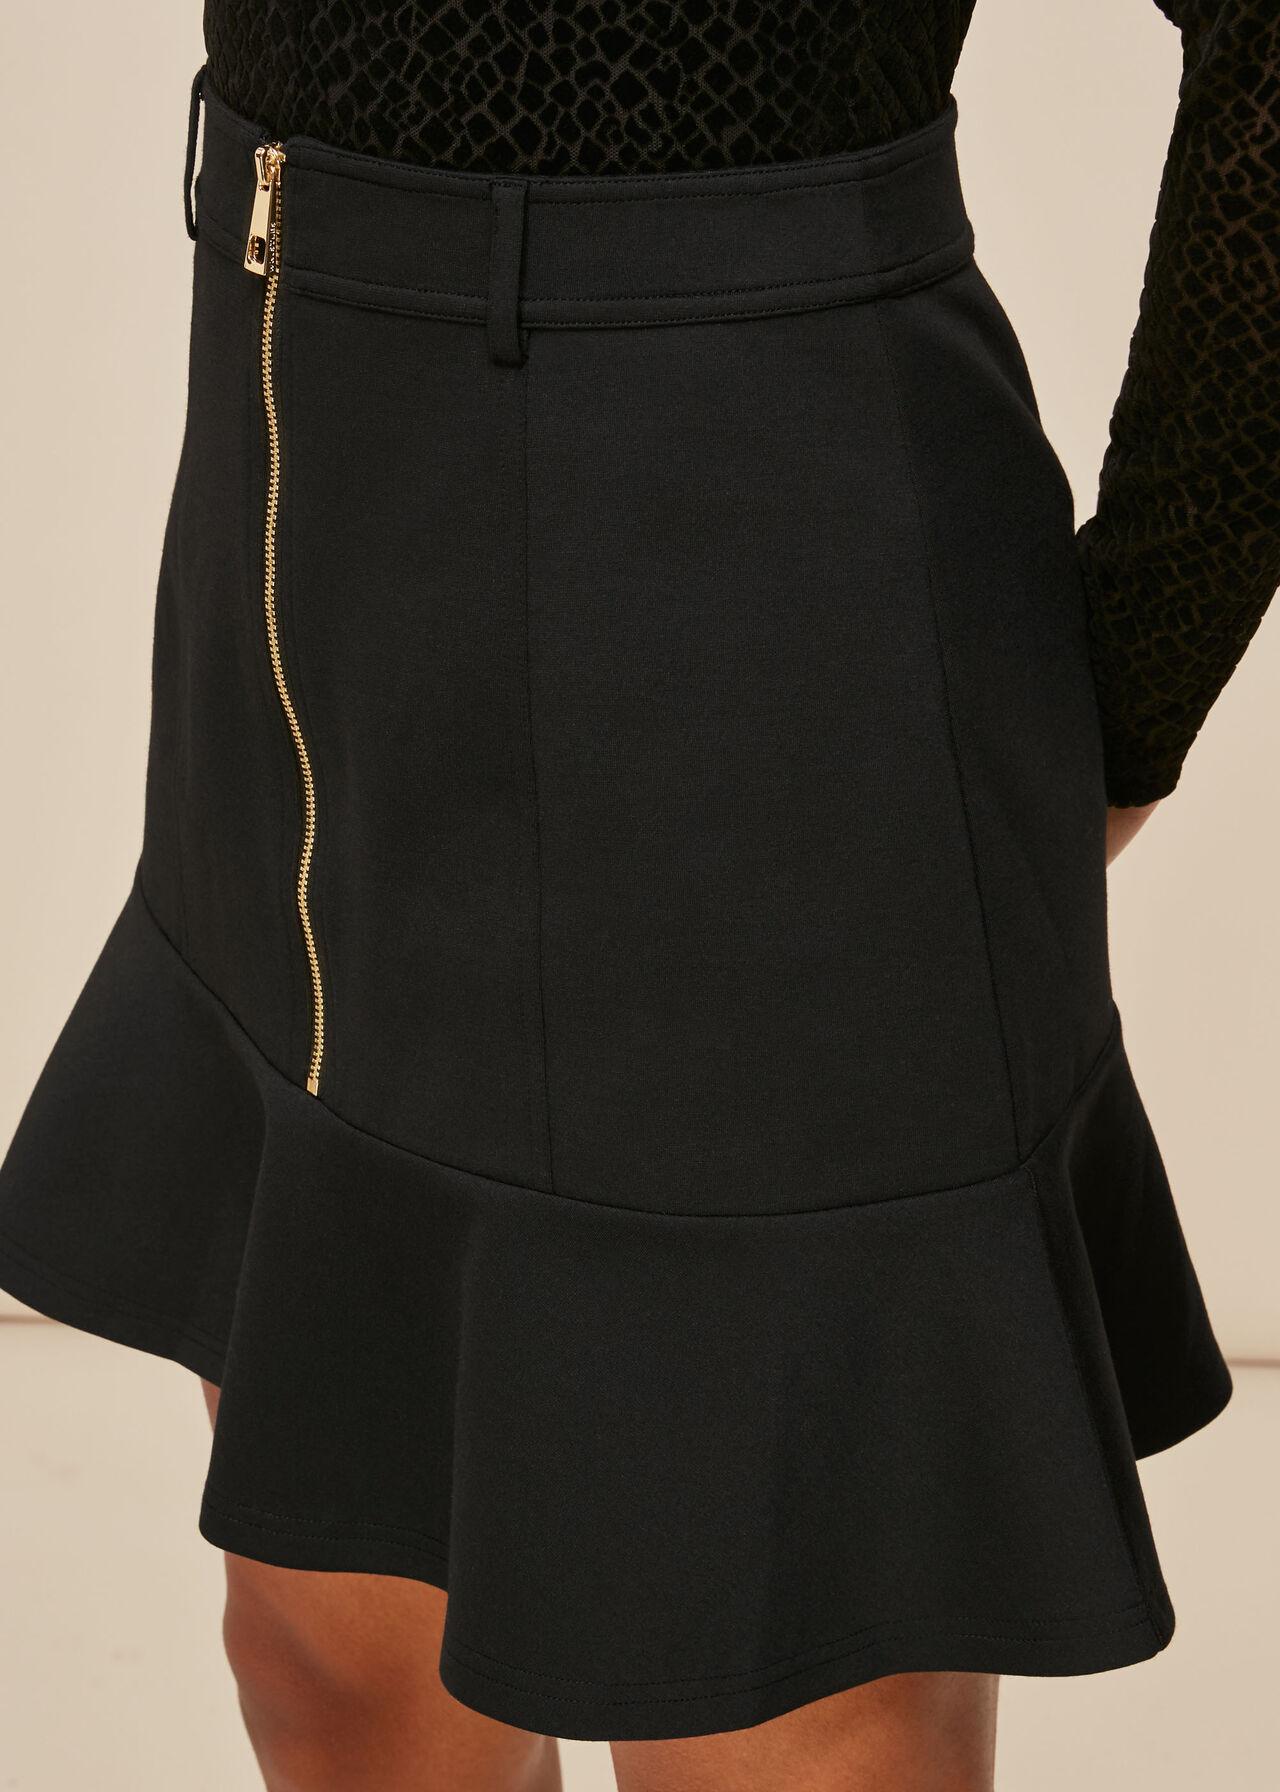 Ponte Peplum Skirt